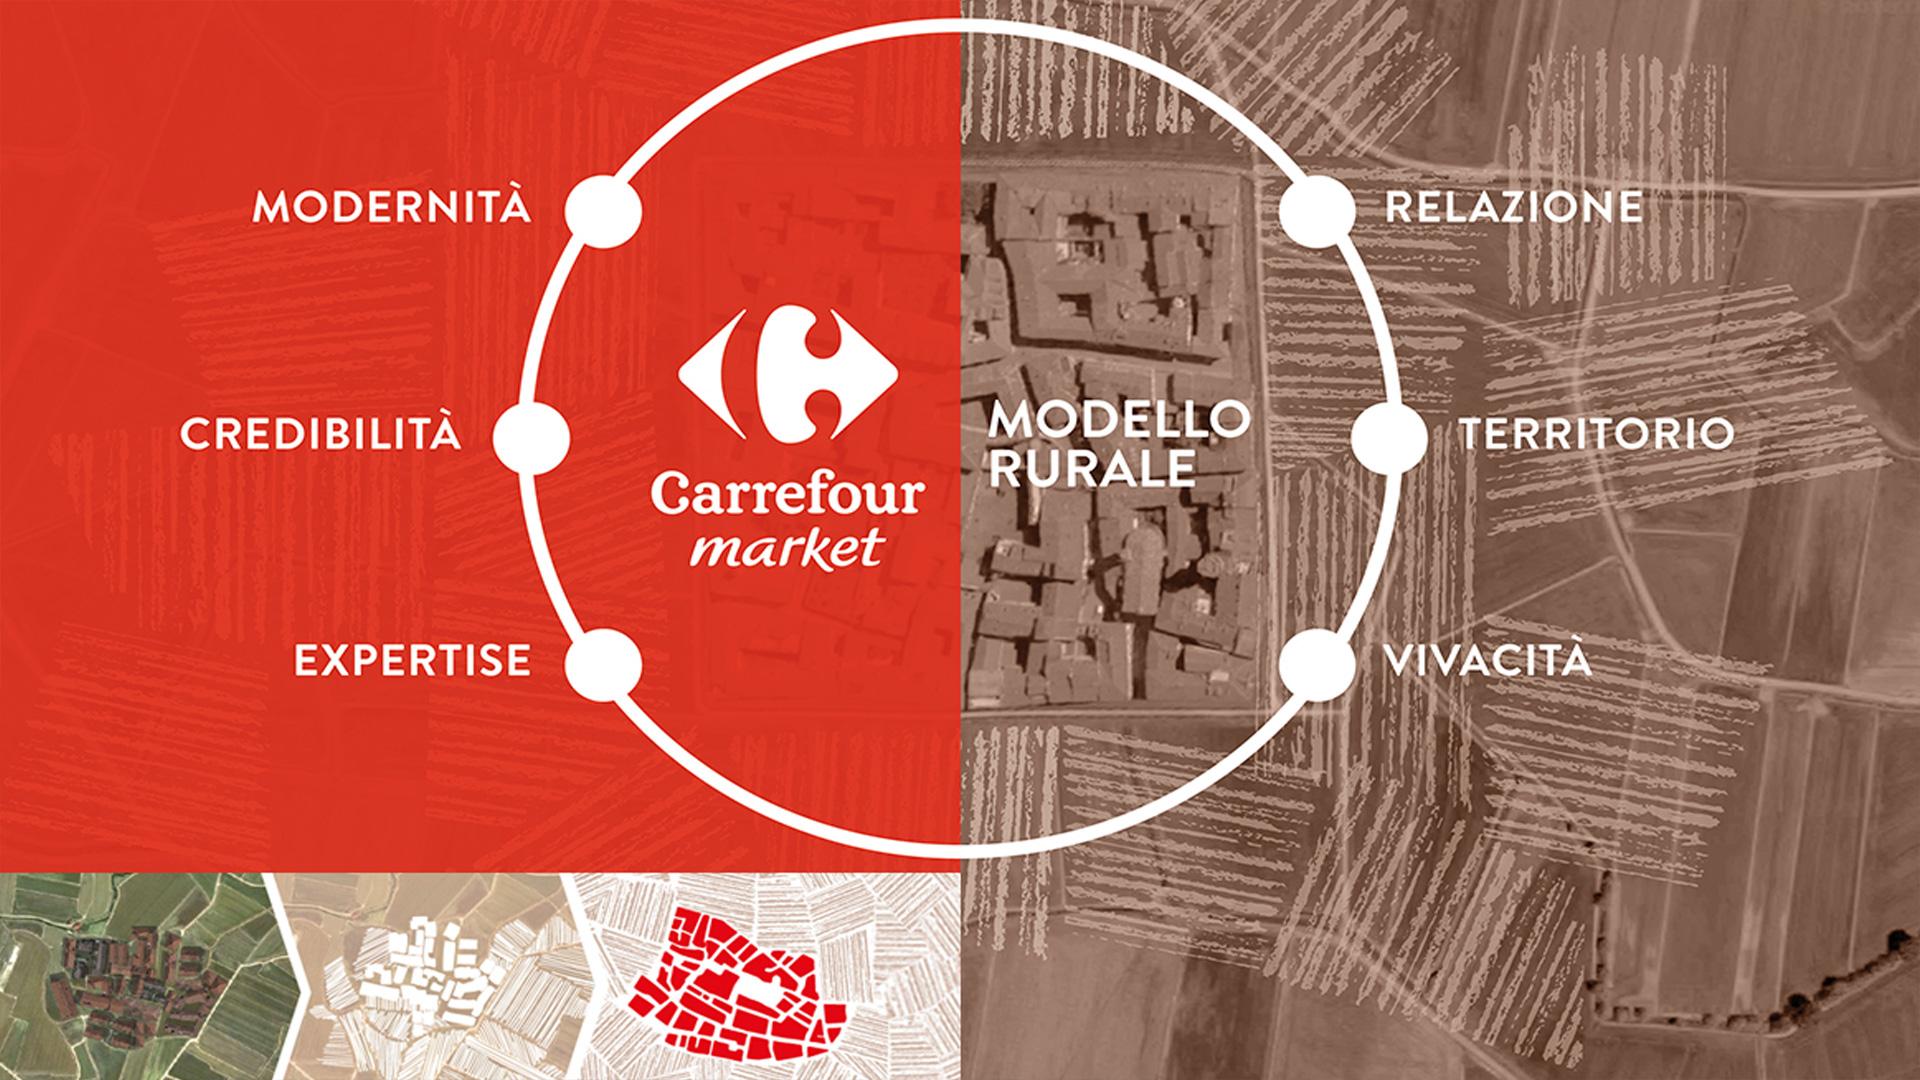 Carrefour-Rba-Design-002